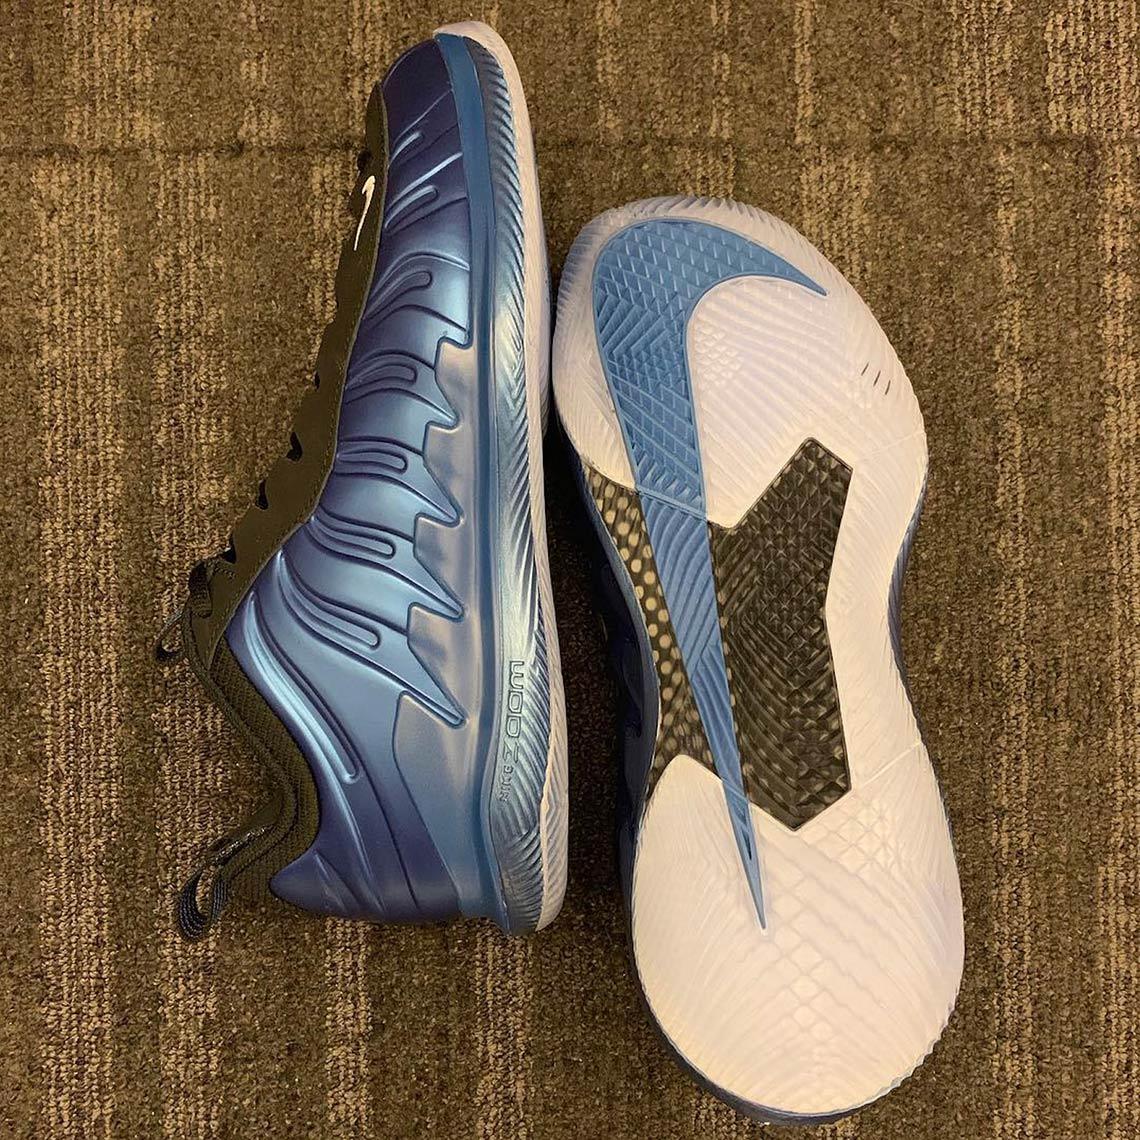 Nike Foamposite Vapor X Tennis Shoe